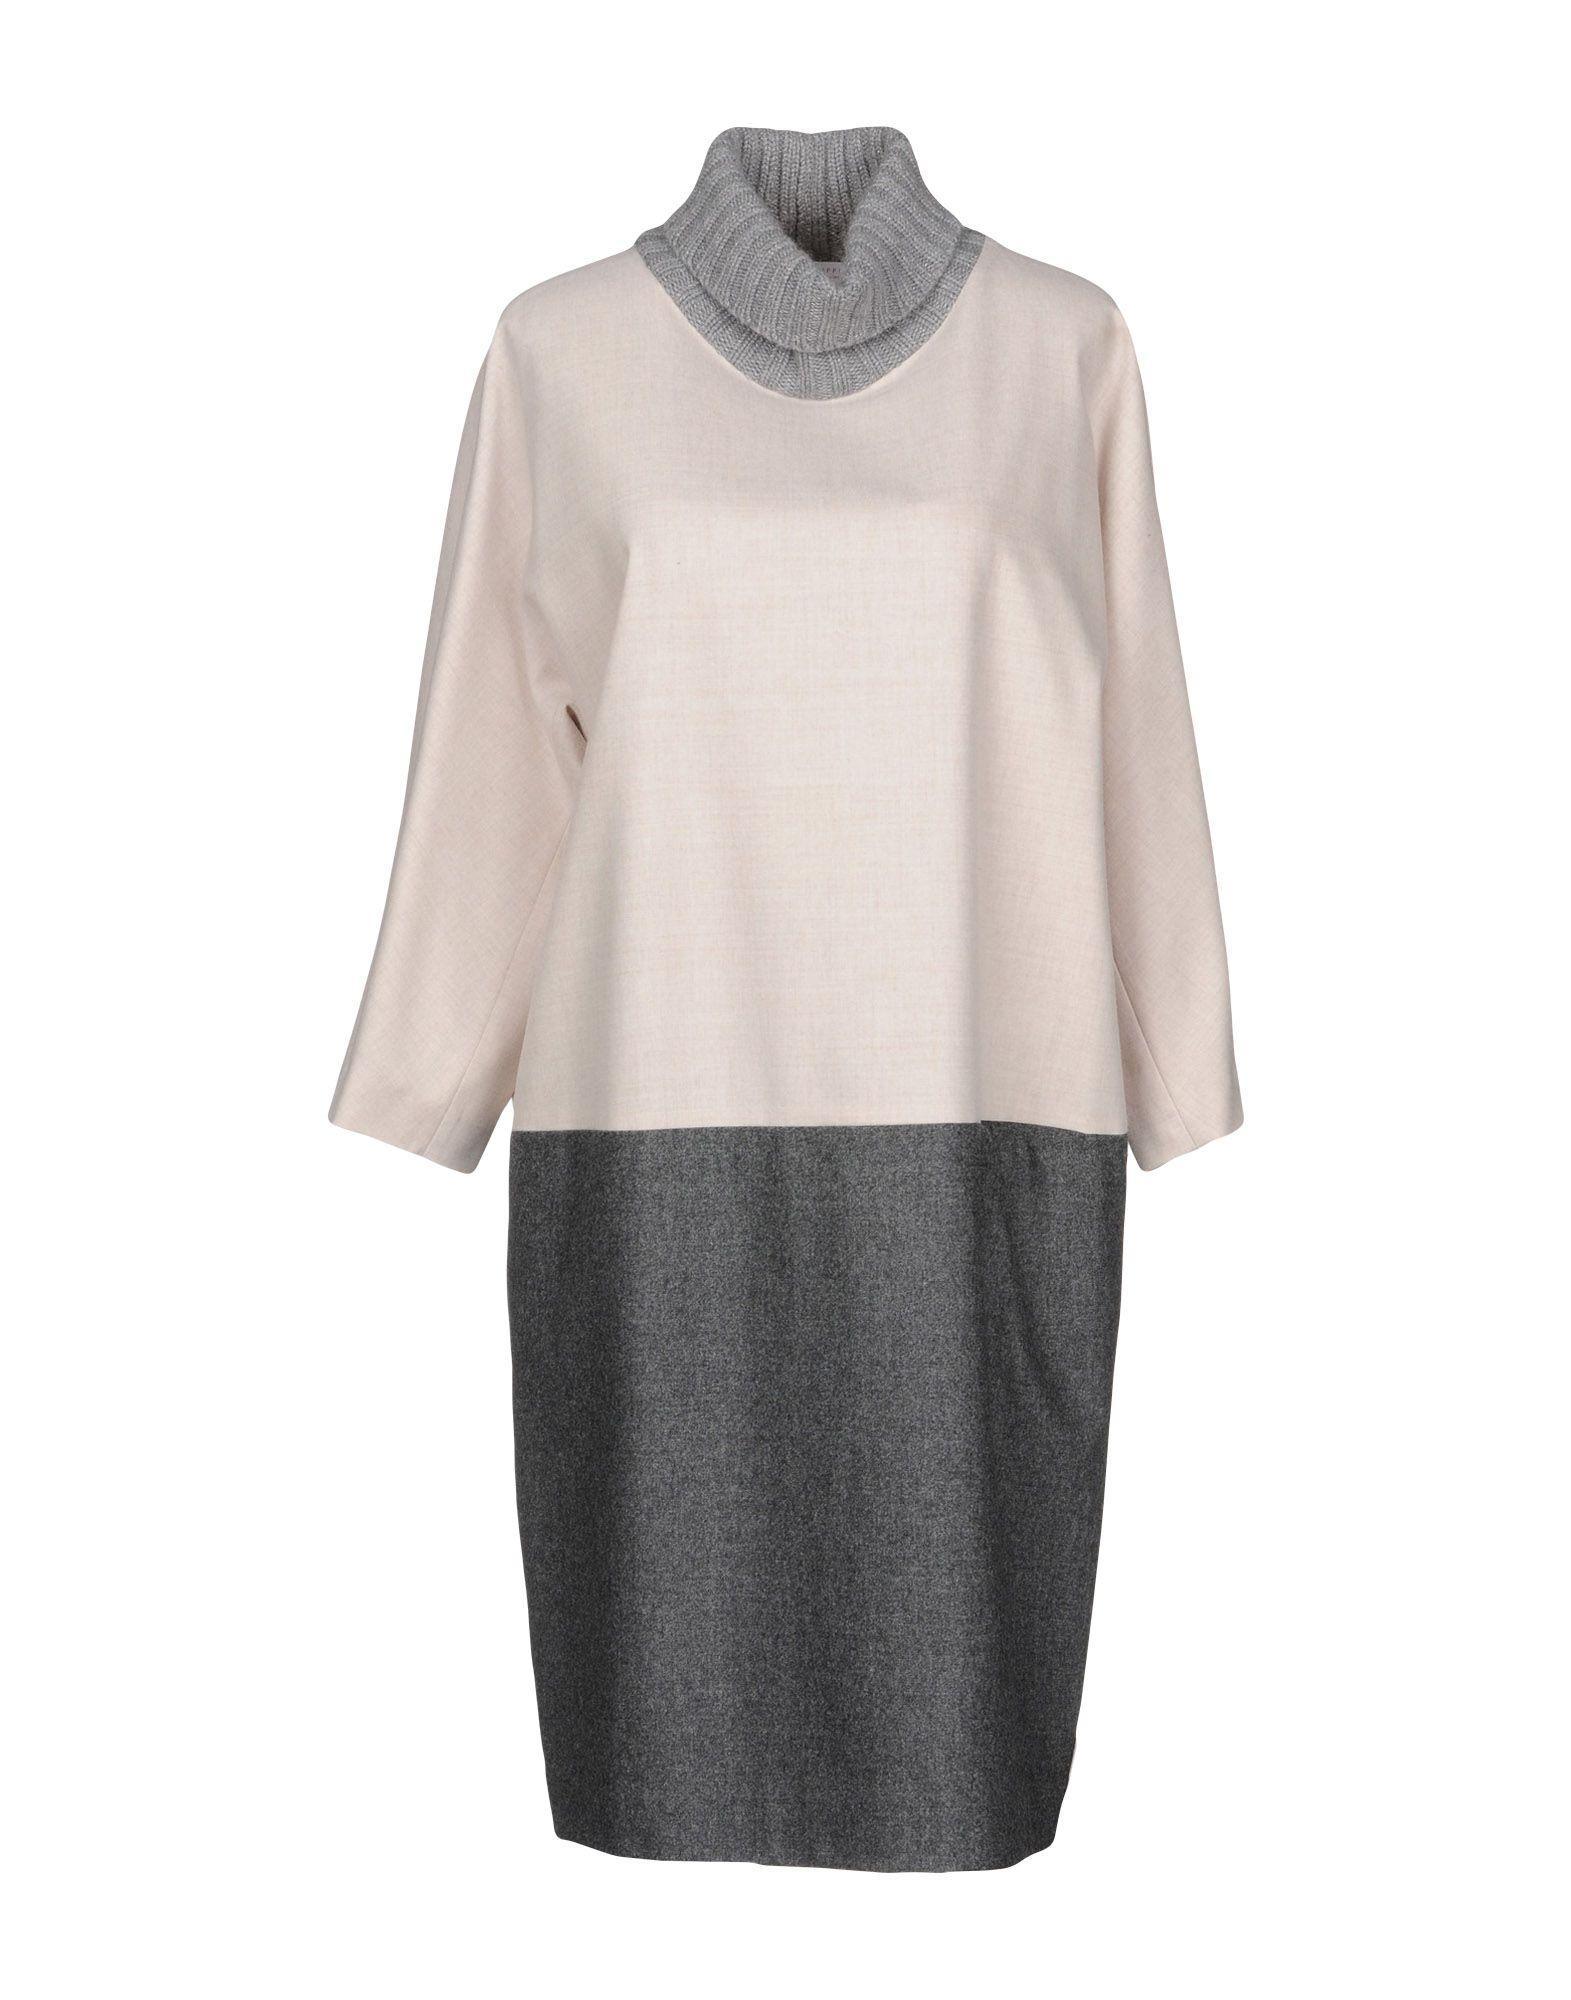 Fabiana Filippi Short Dress In Beige